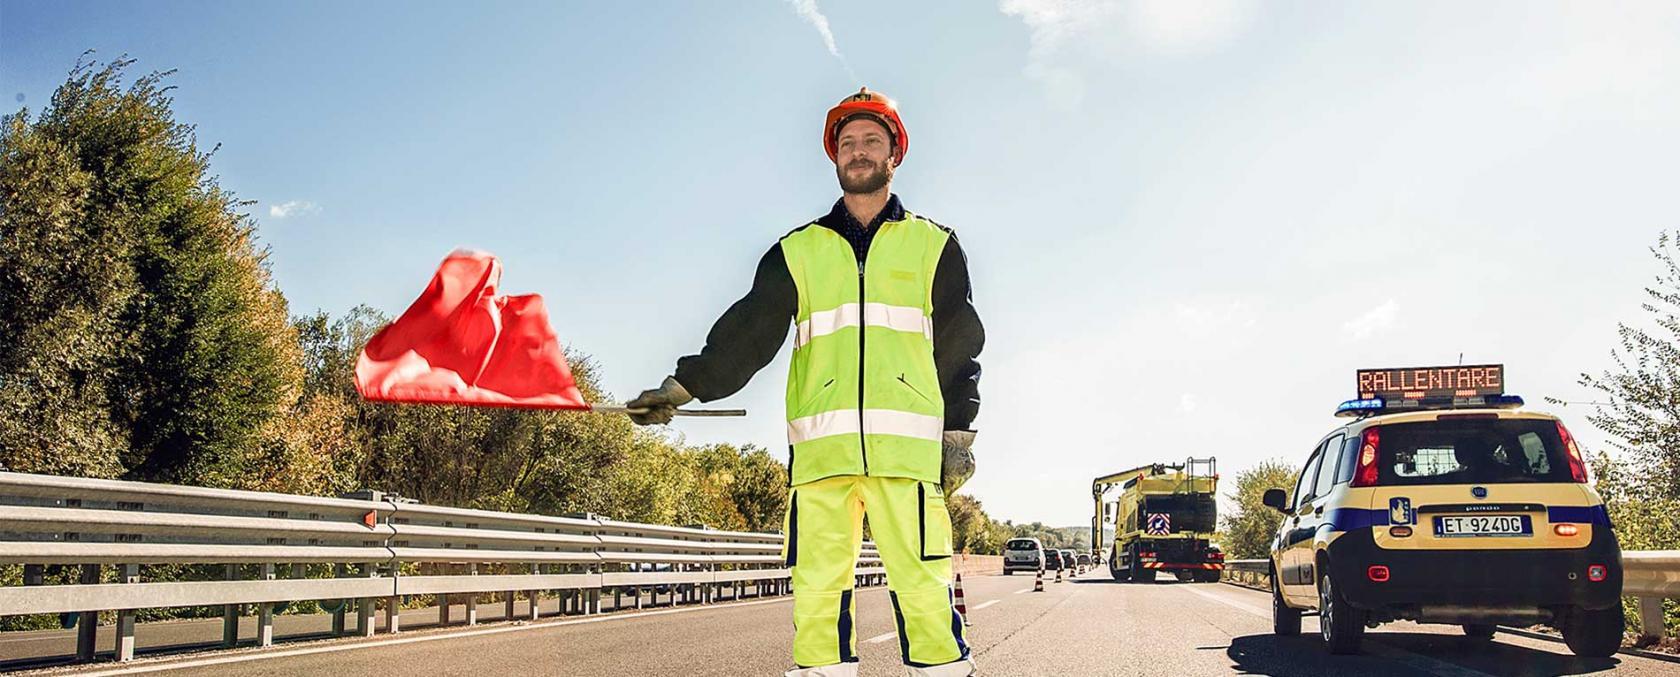 lavori in autostrada homepage Anas